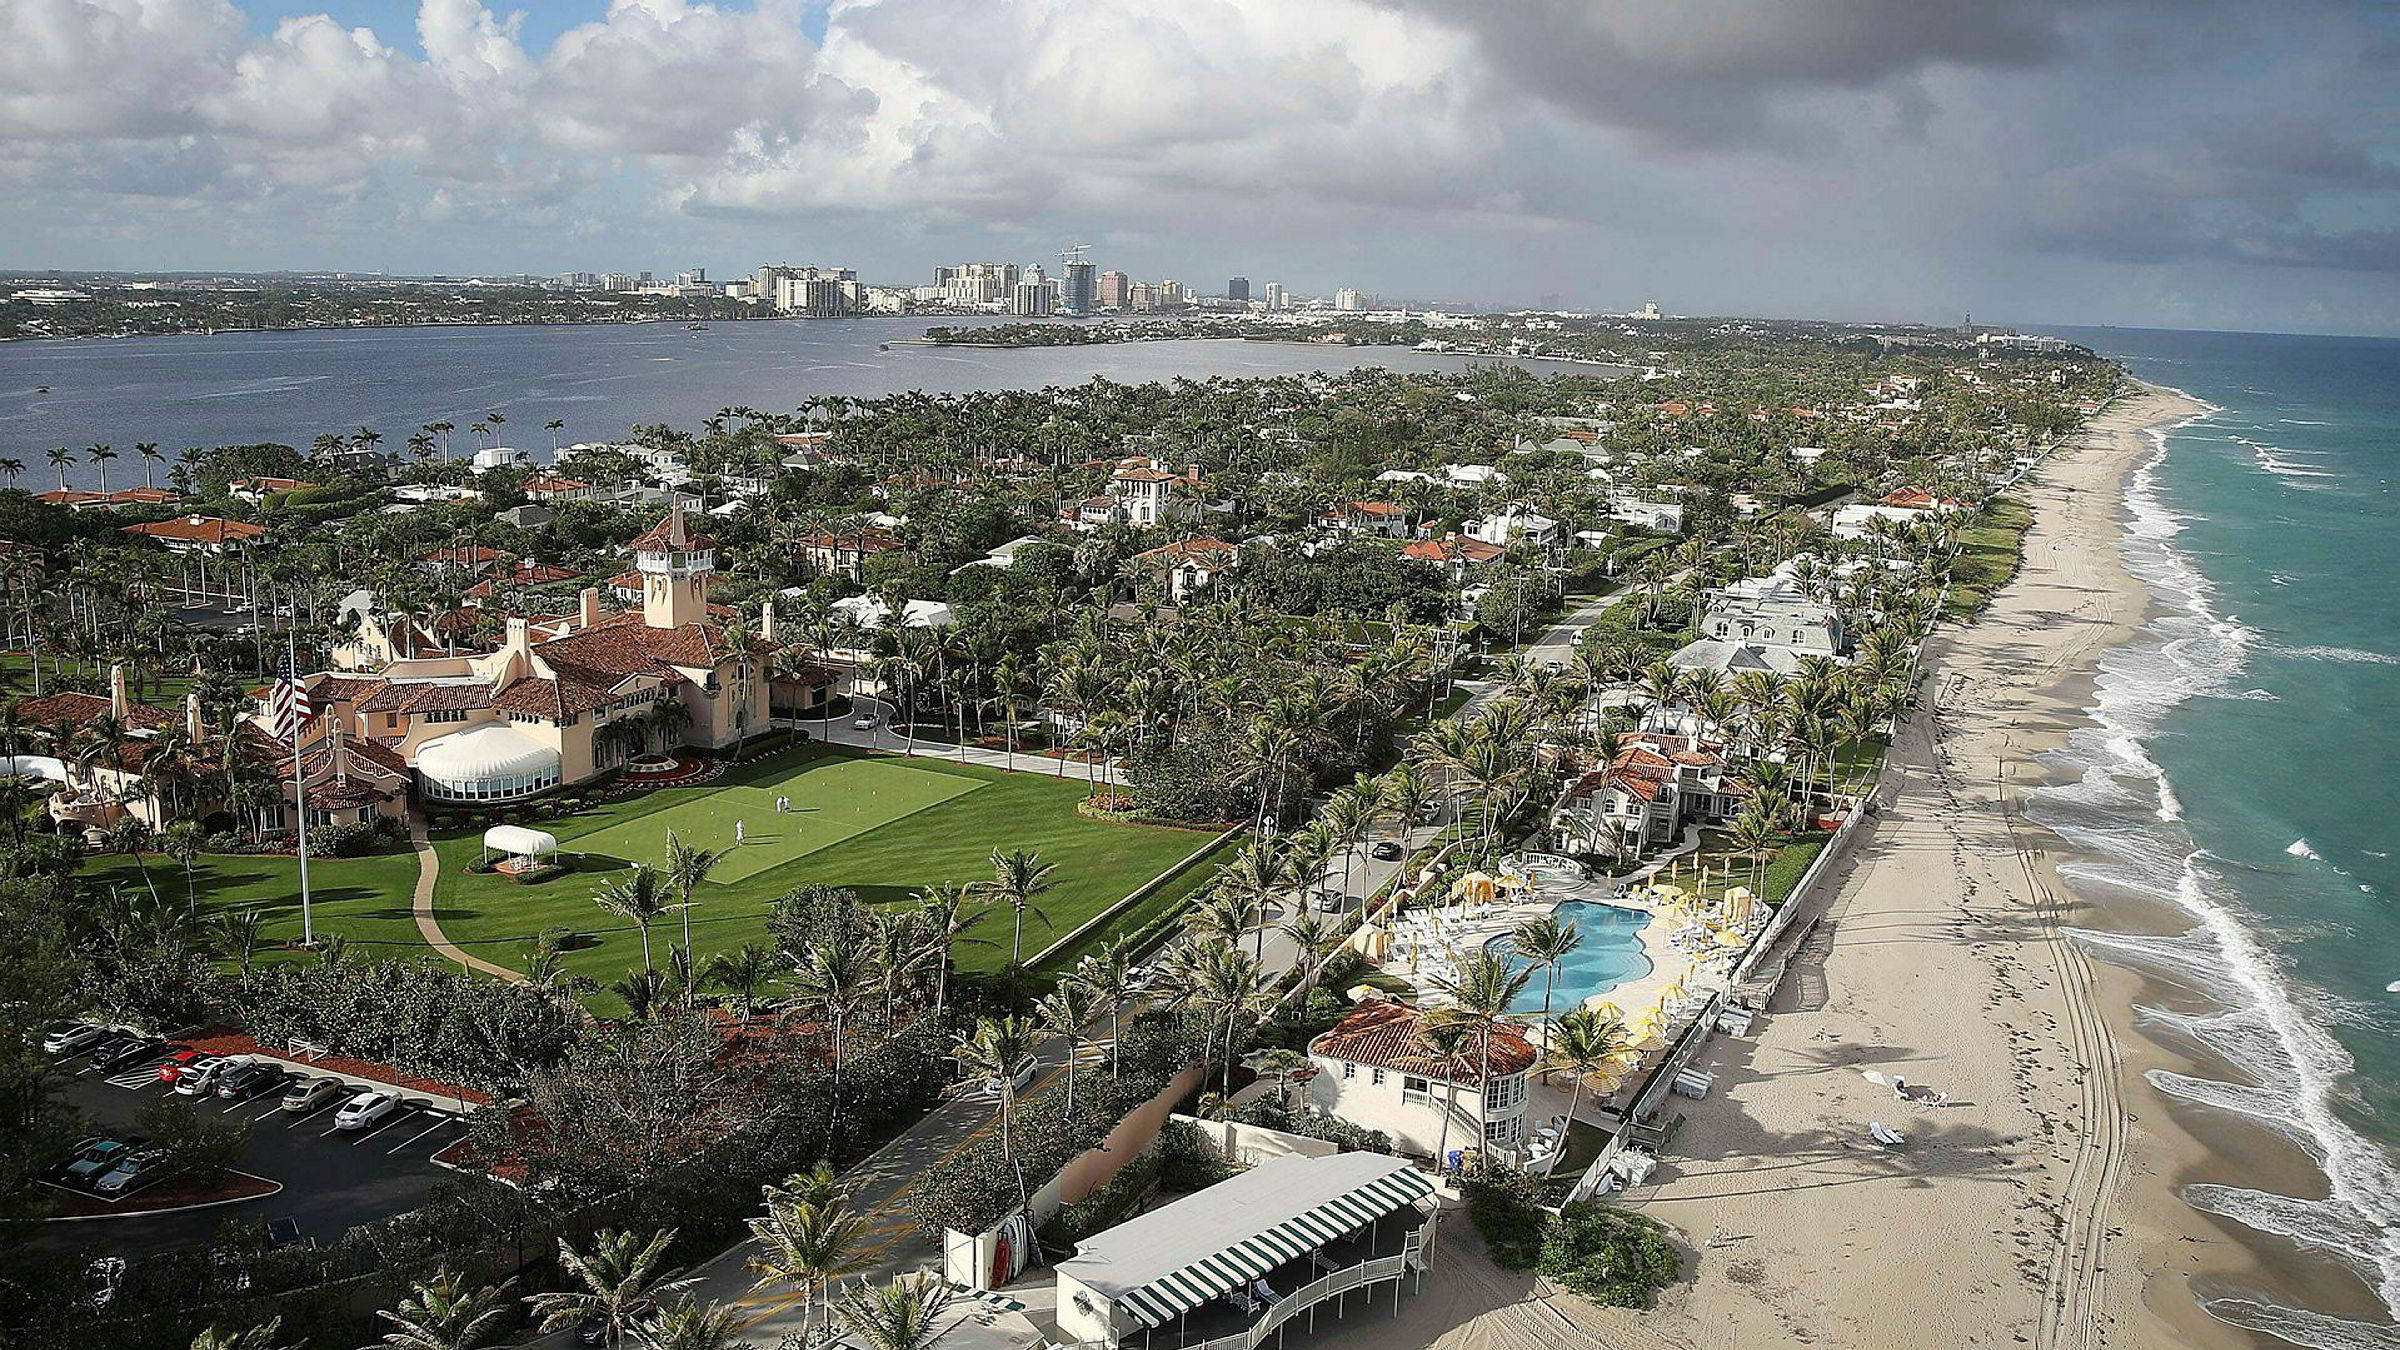 Bildet viser president Donald Trumps resort Mar-a-Lago i Florida i USA.